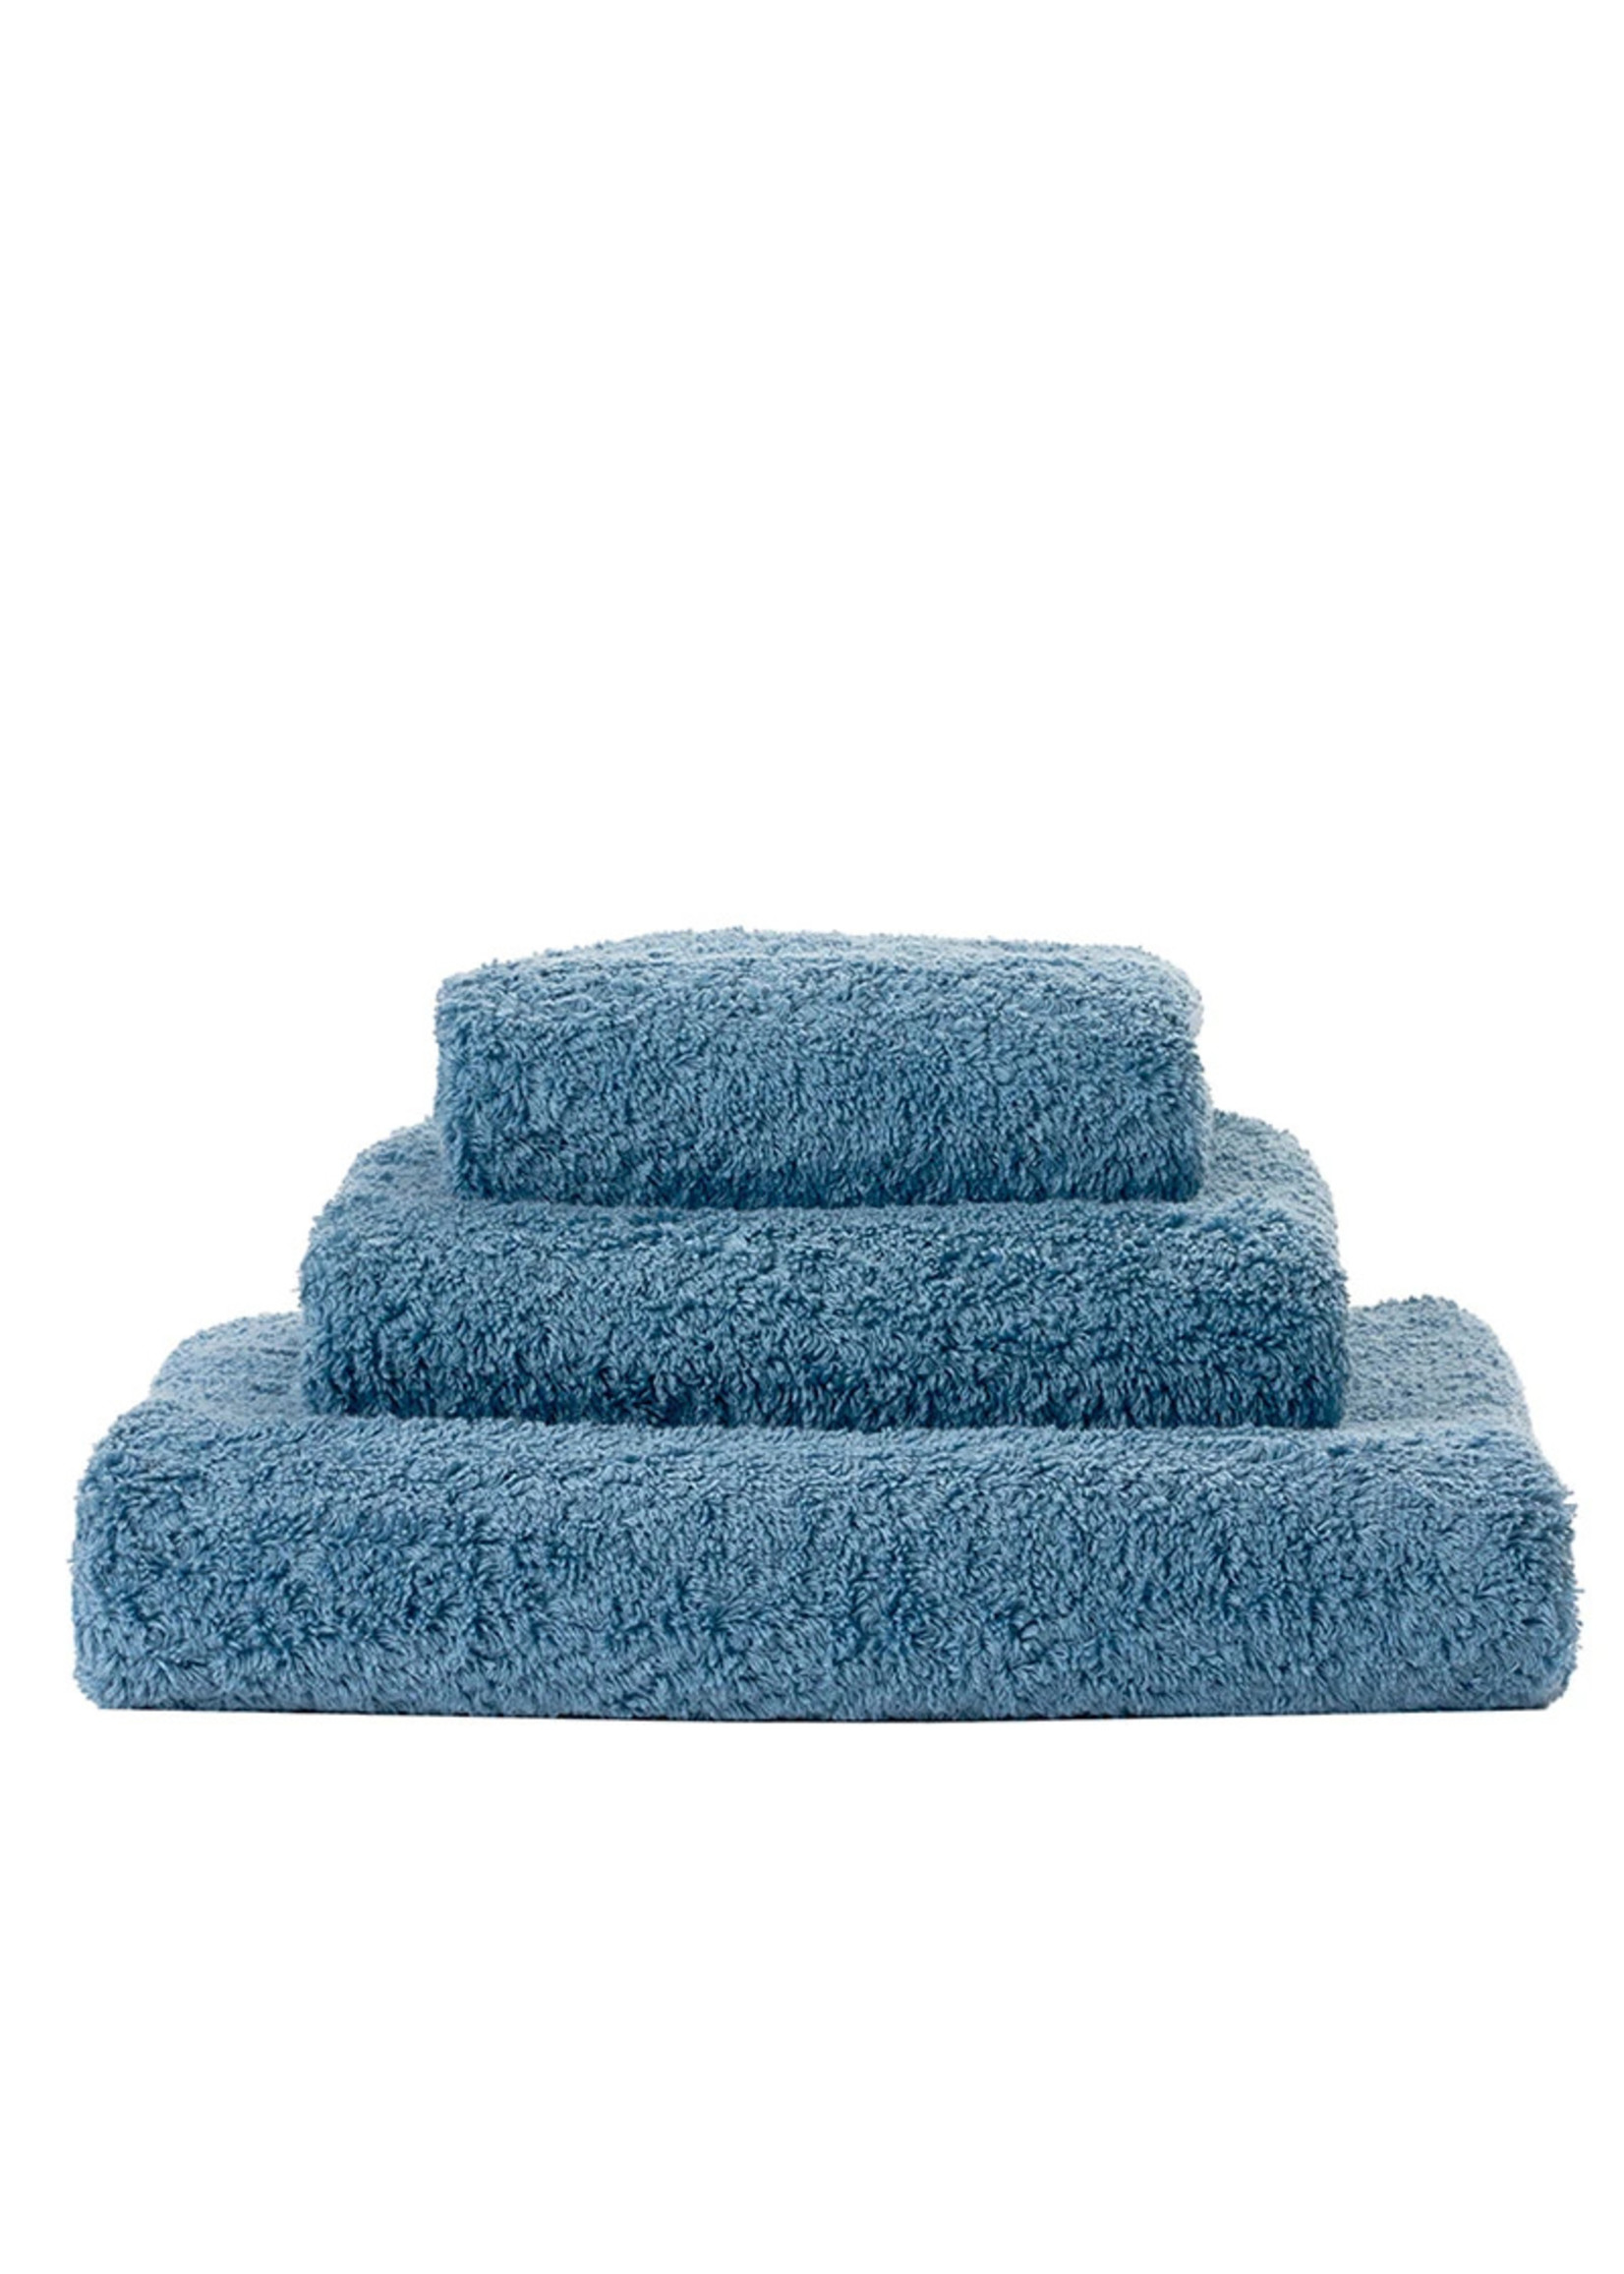 Abyss & Habidecor Super Pile Bluestone Towels